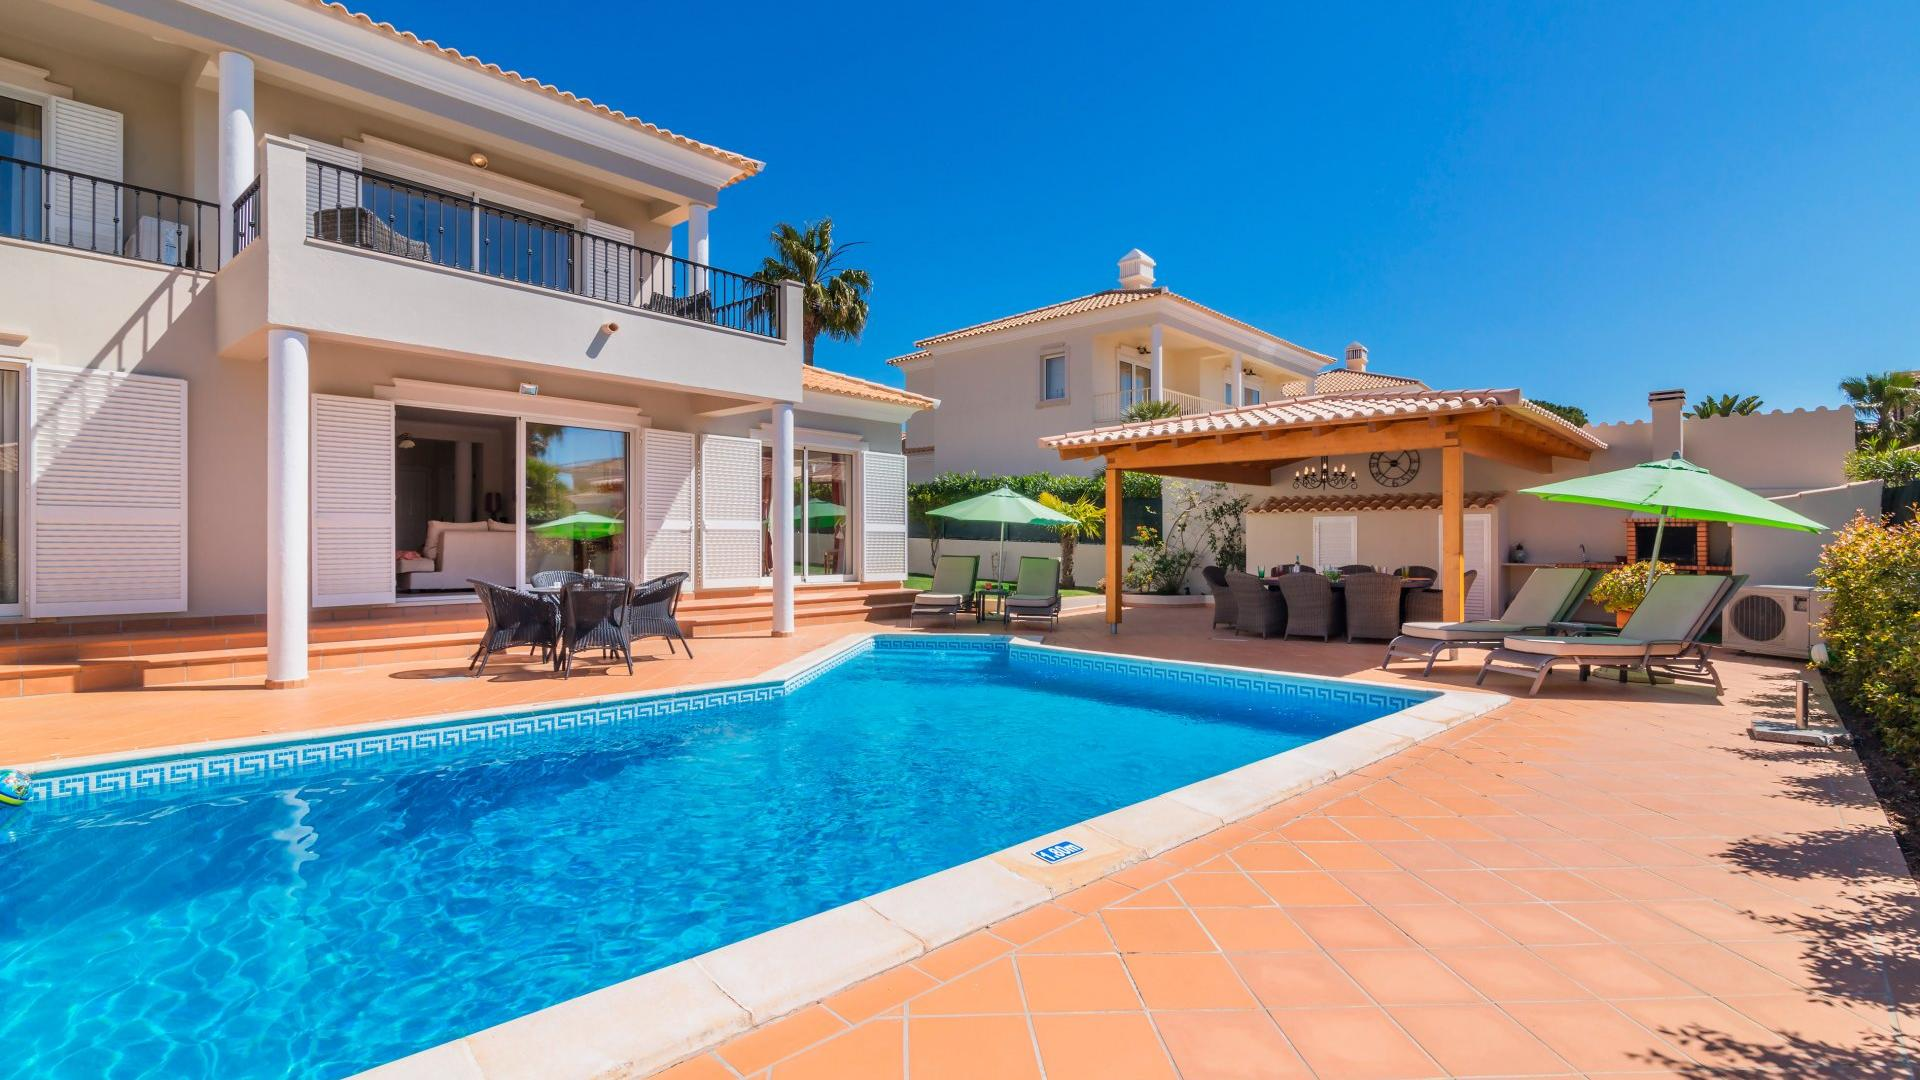 Casa Julima - Varandas do Lago, Quinta do Lago, Algarve - 5.jpg